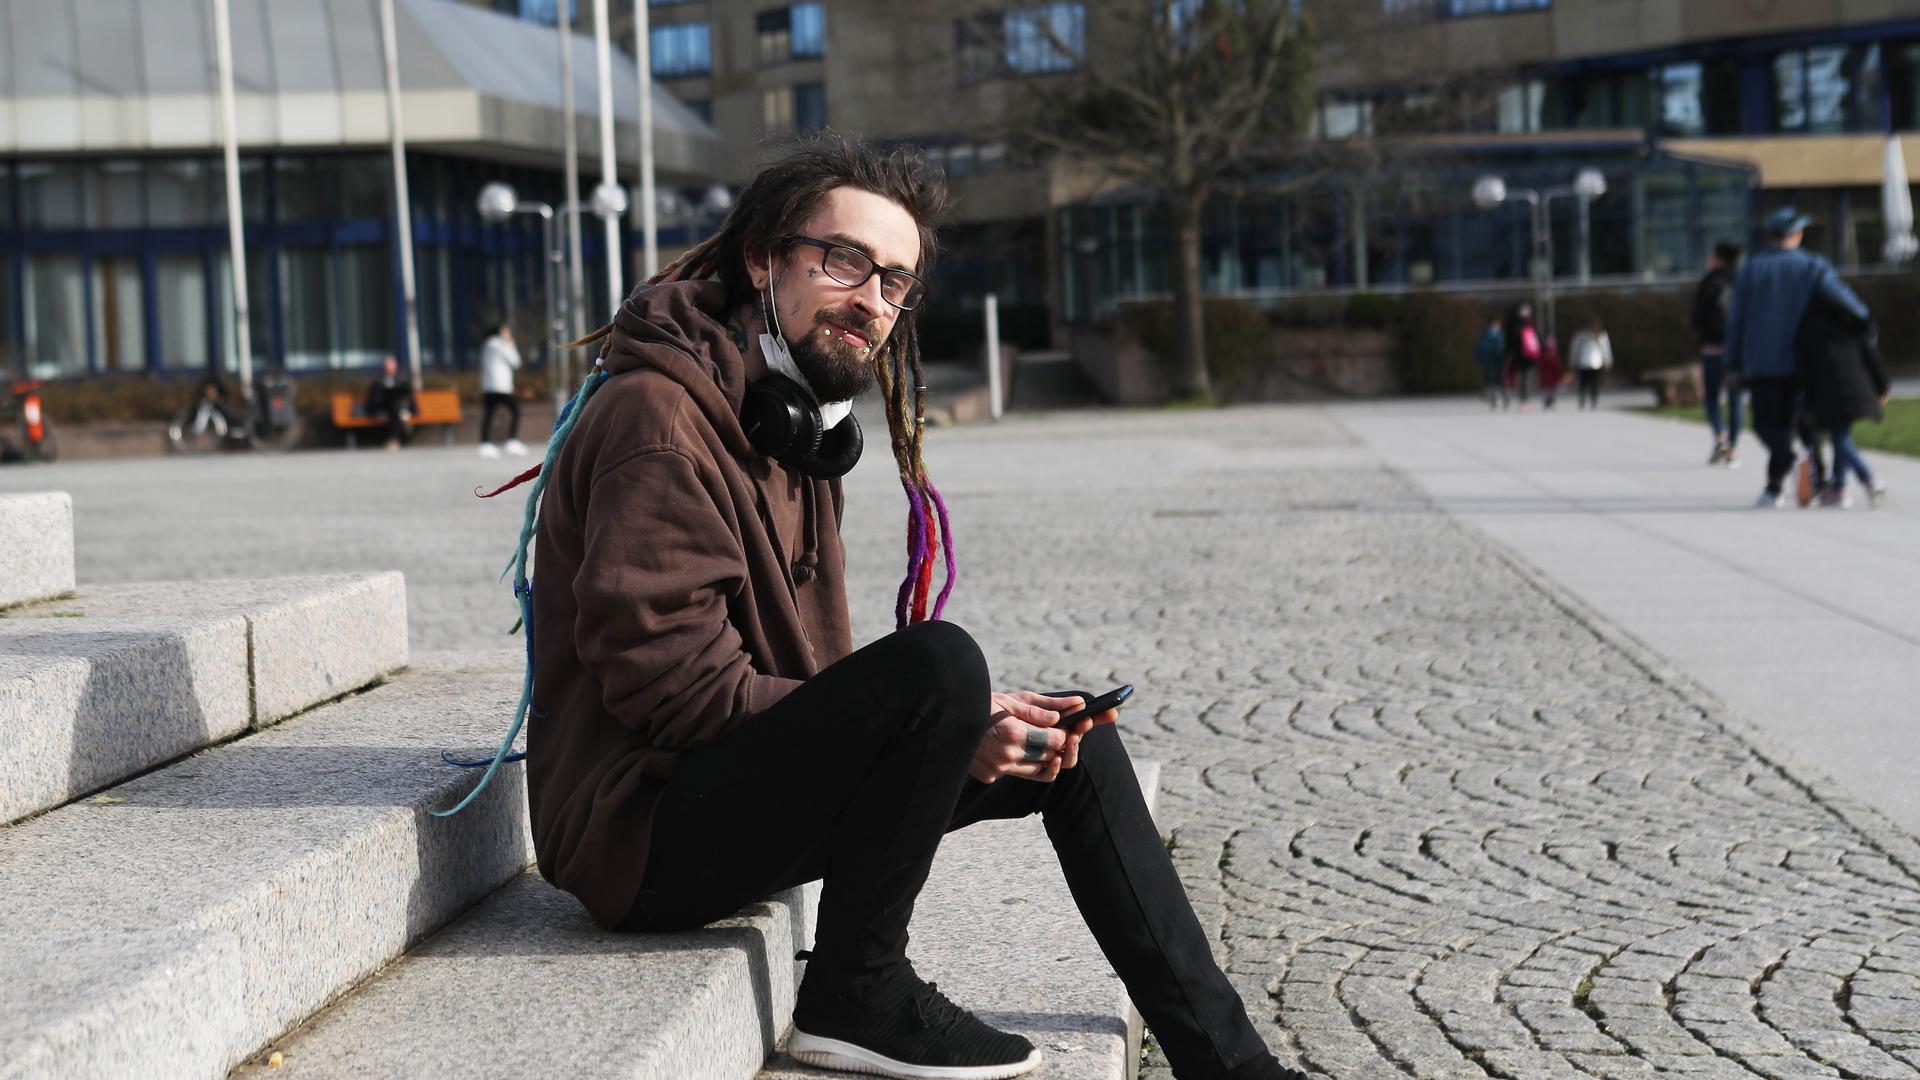 Aaron Proctor aus Pforzheim_Rechts hinten Parkhotel PF